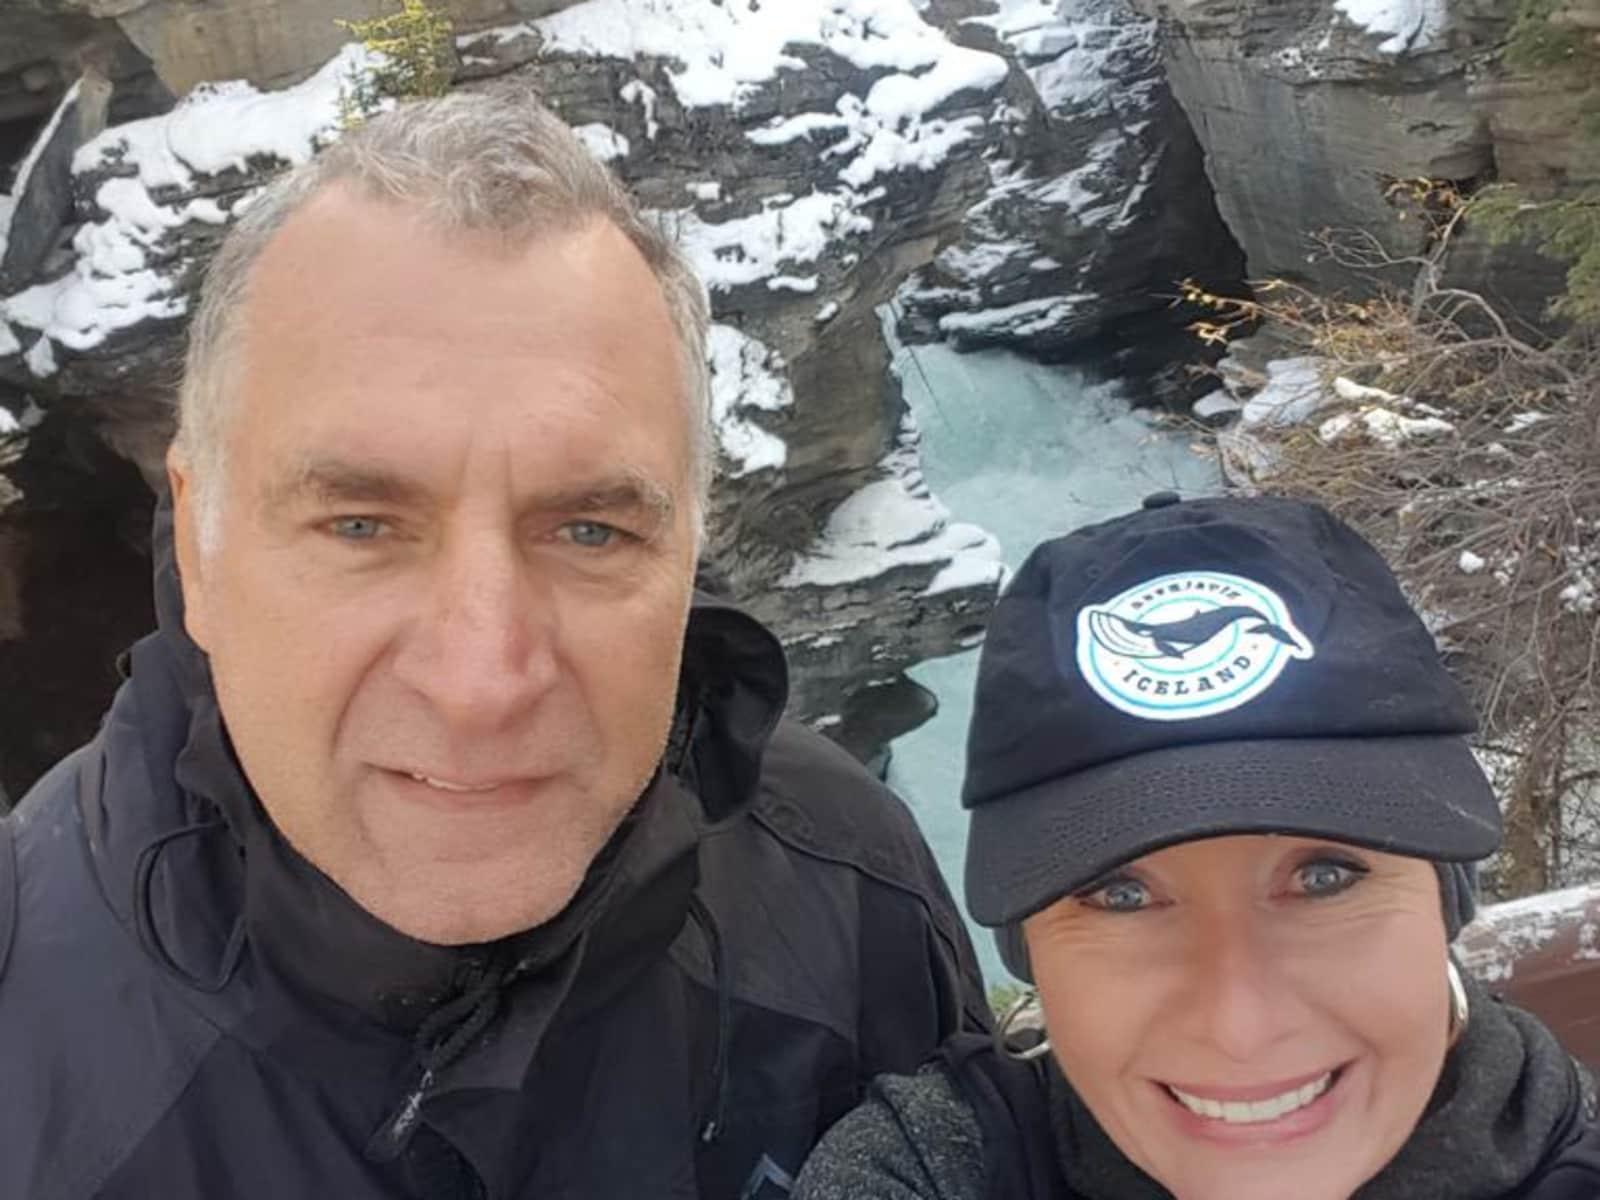 Buks & Sonja from Nelspruit, South Africa